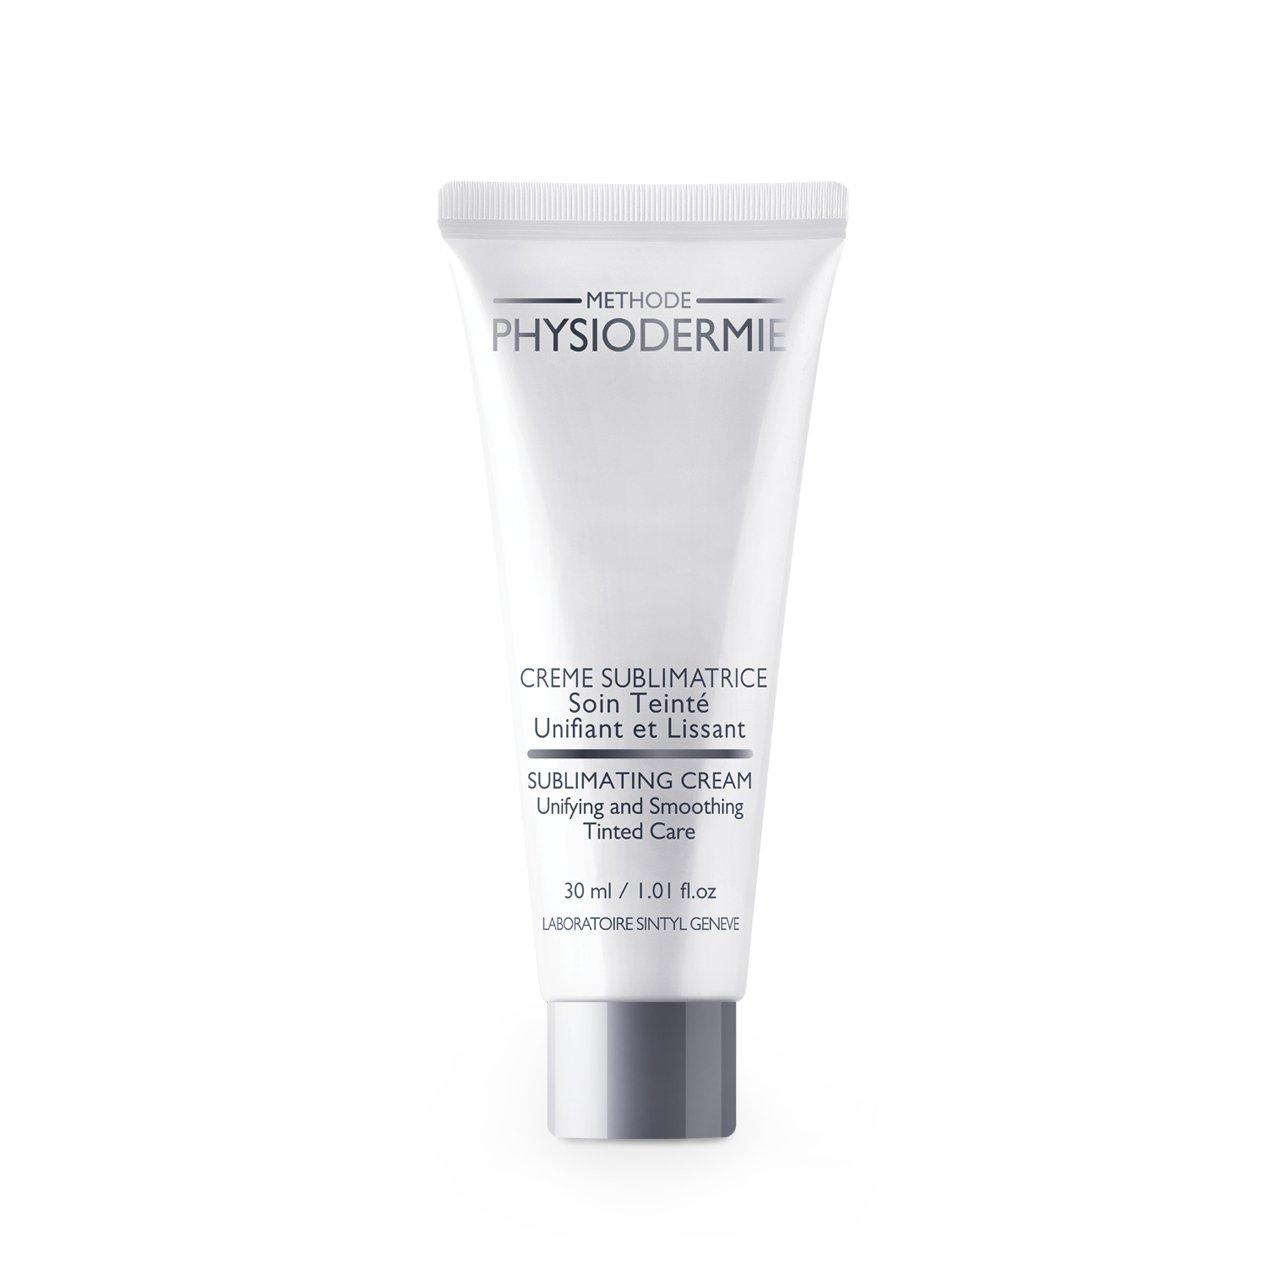 B07D1VDP3F Physiodermie Sublimating Cream Unifying And Smoothing Tinted Care 02 (Medium/Dark) 30 ml/1.01 fl.oz 51s9u1YMa9L._SL1280_